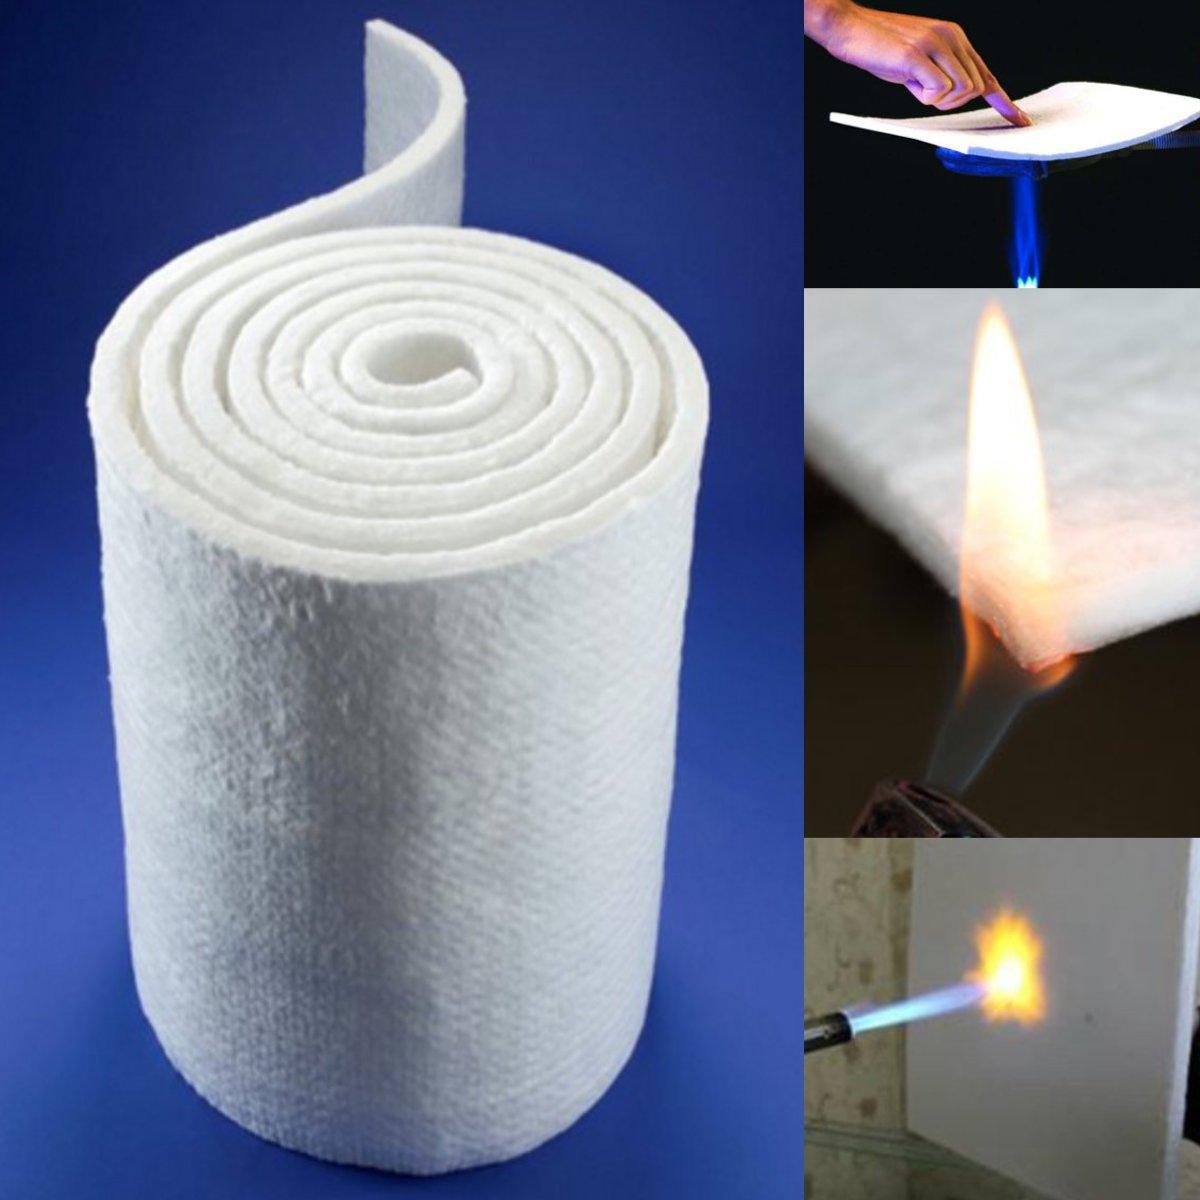 Aerogel de Sílica Sólido para Dutos Super Leve Hidrofóbica Isolamento Térmico Mat Tapete Macio Bloco Industriais Branco 30x140cm 3 – 6 10mm